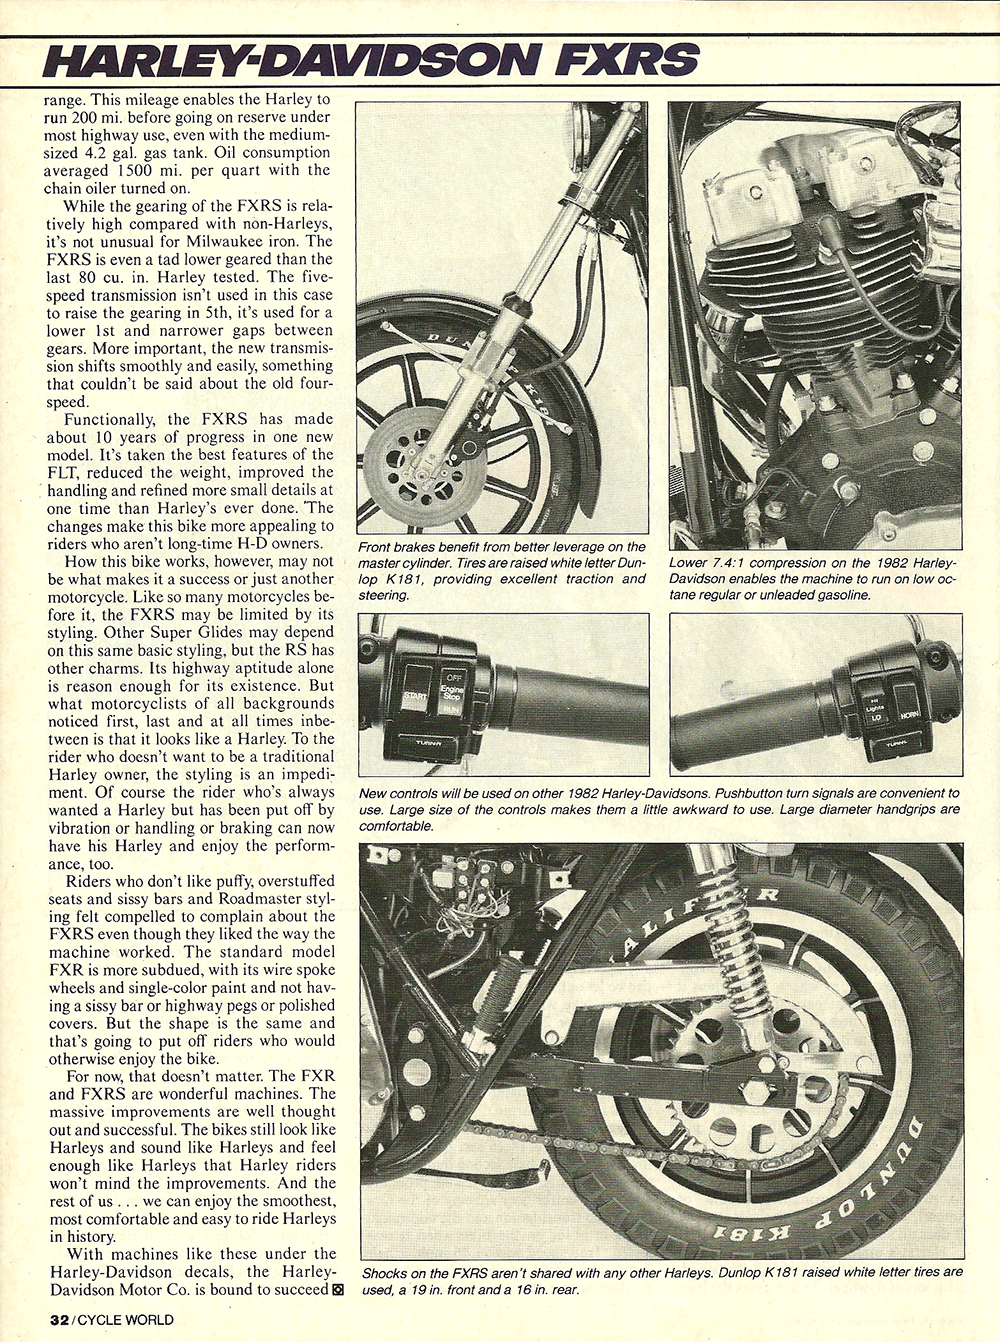 1981 Harley-Davidson FXRS road test 5.jpg